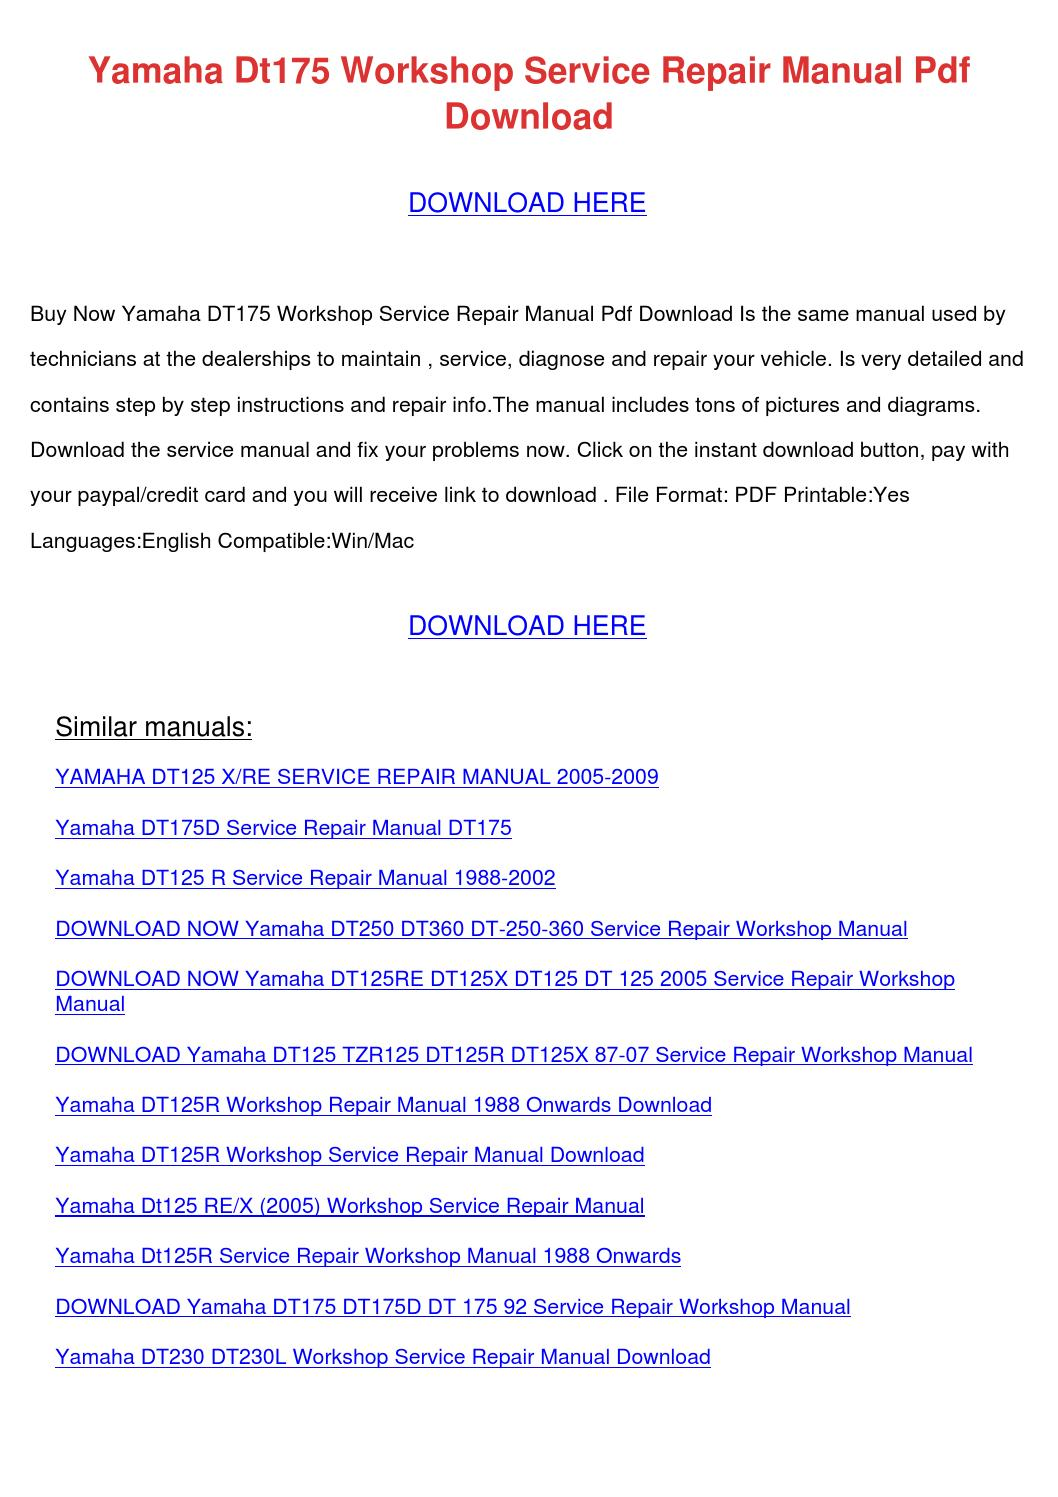 Yamaha Dt175 Workshop Service Repair Manual P By